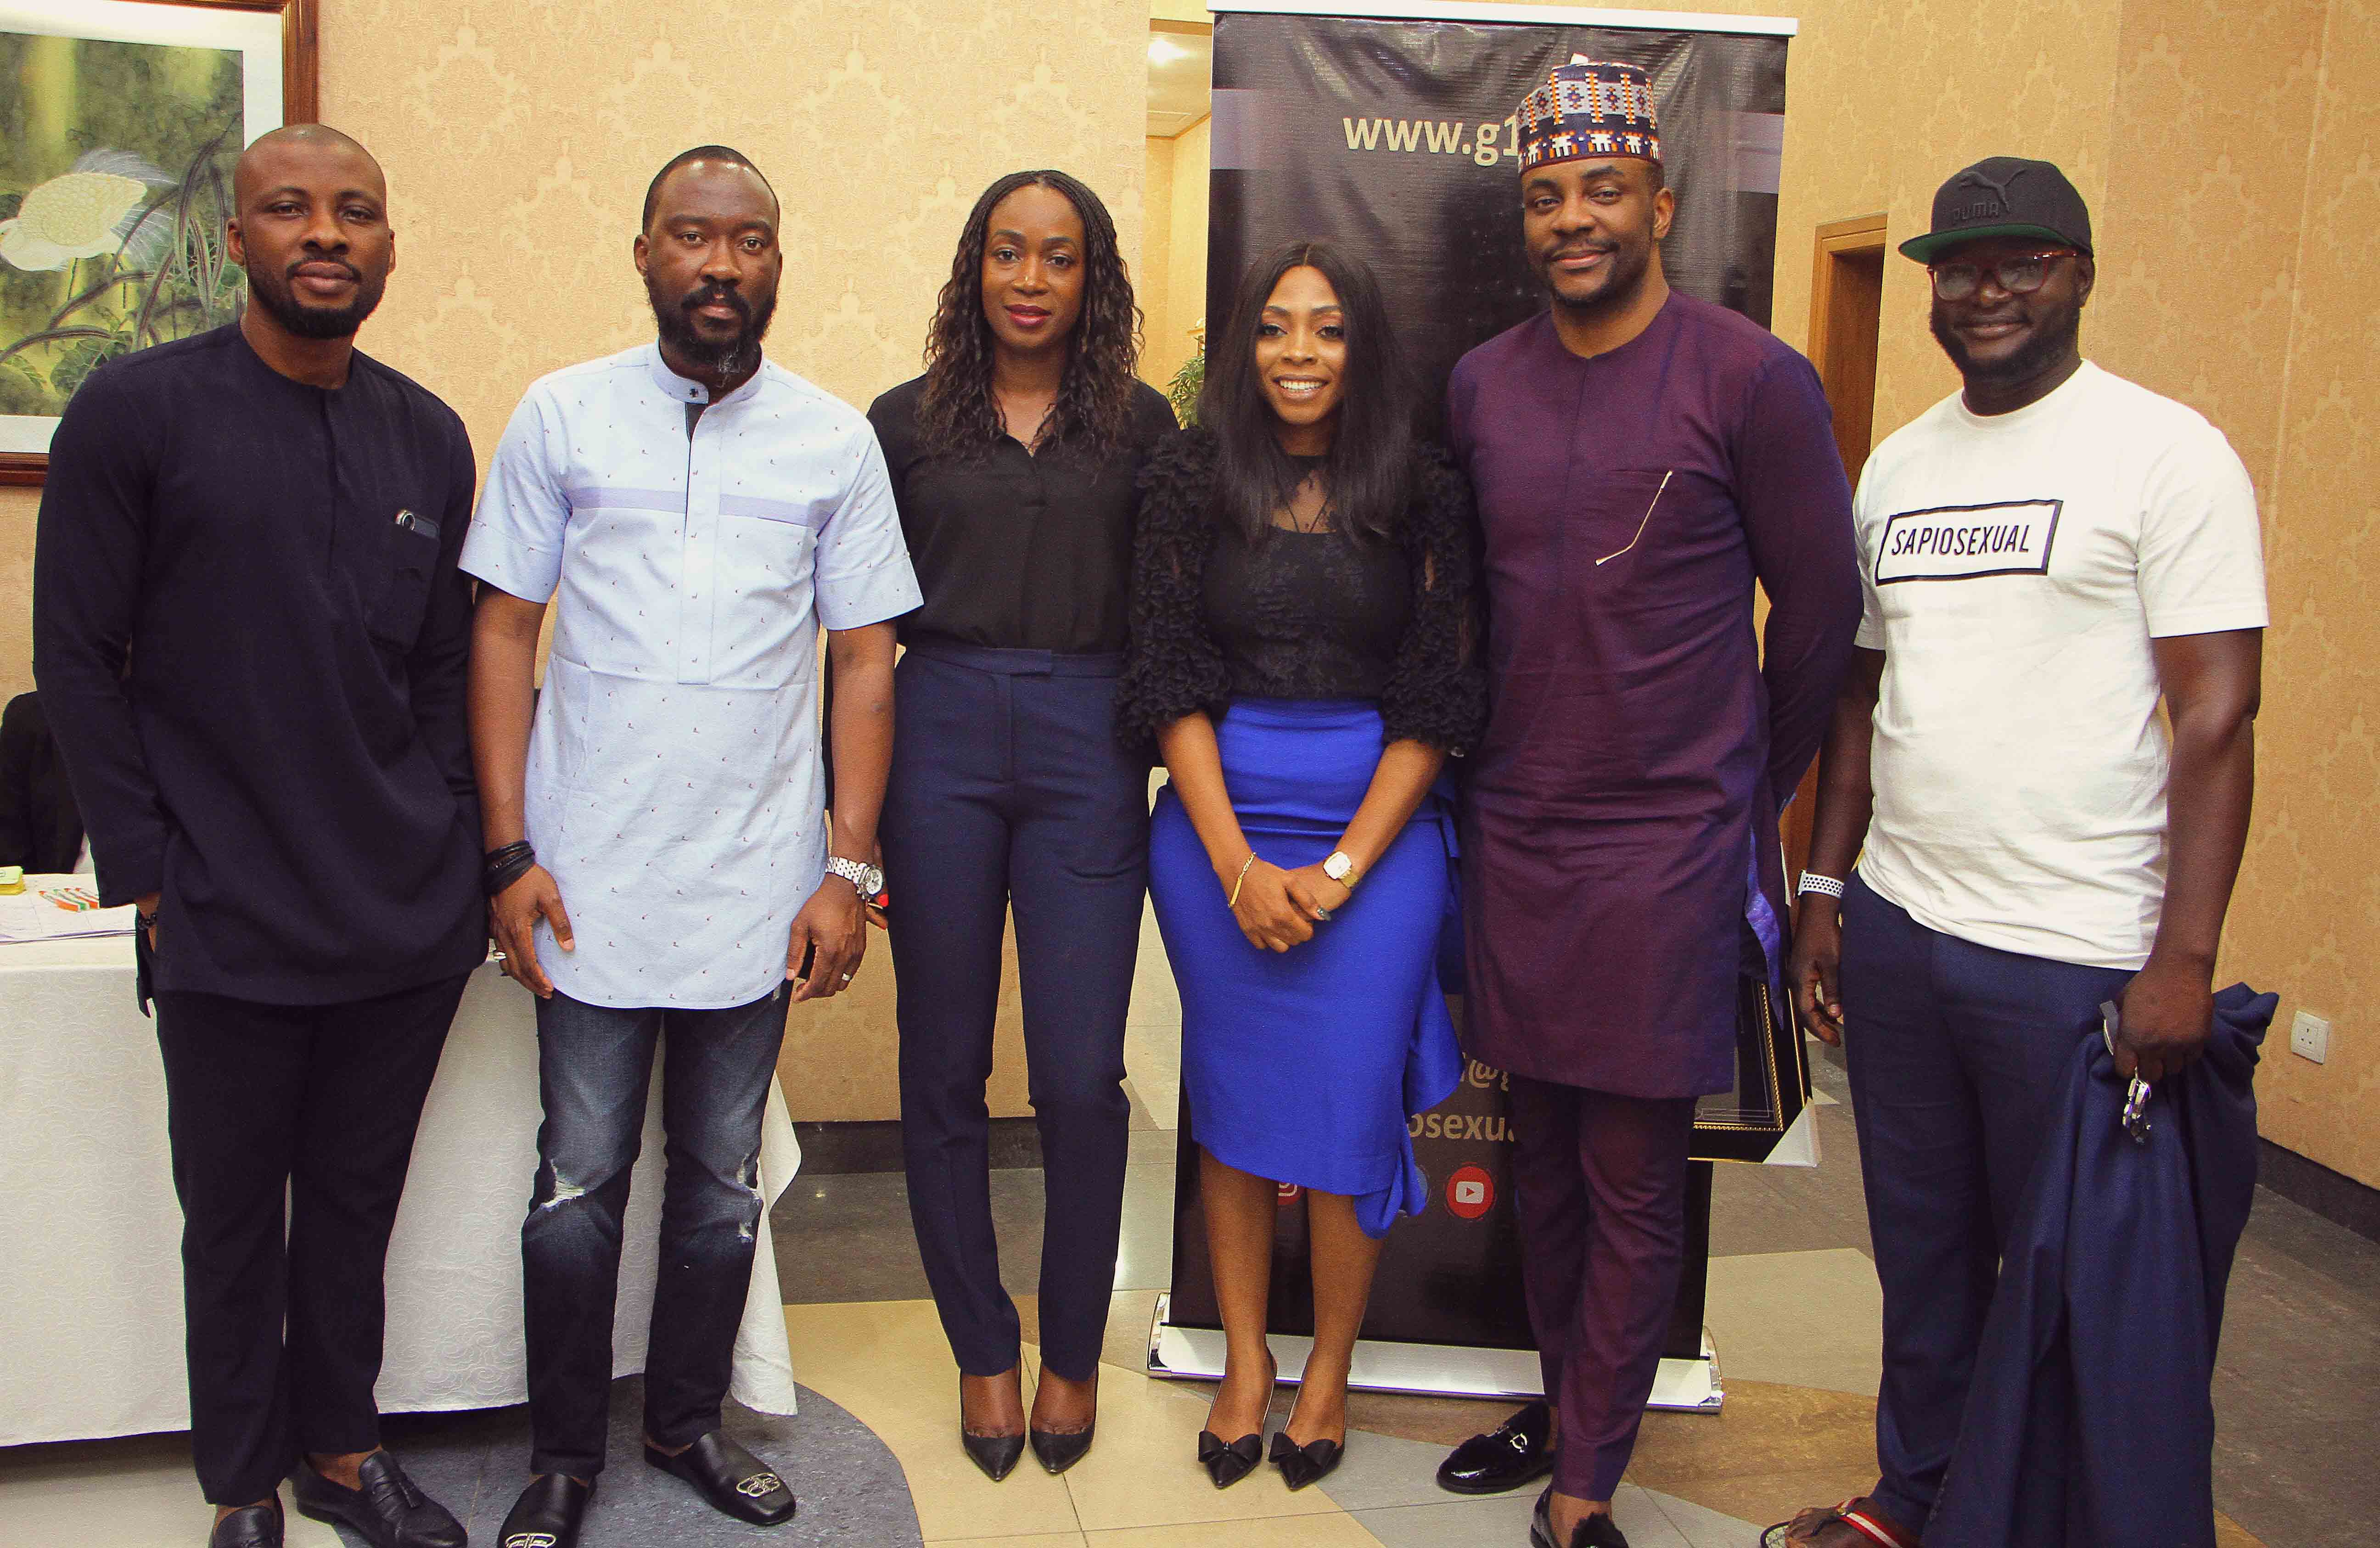 Ebuka, Bekeme Masade Olowora, Ugo Monye bared their Truths on 'Success' at the Sapio Club Hangout themed 'I made it, so can you 2.0'